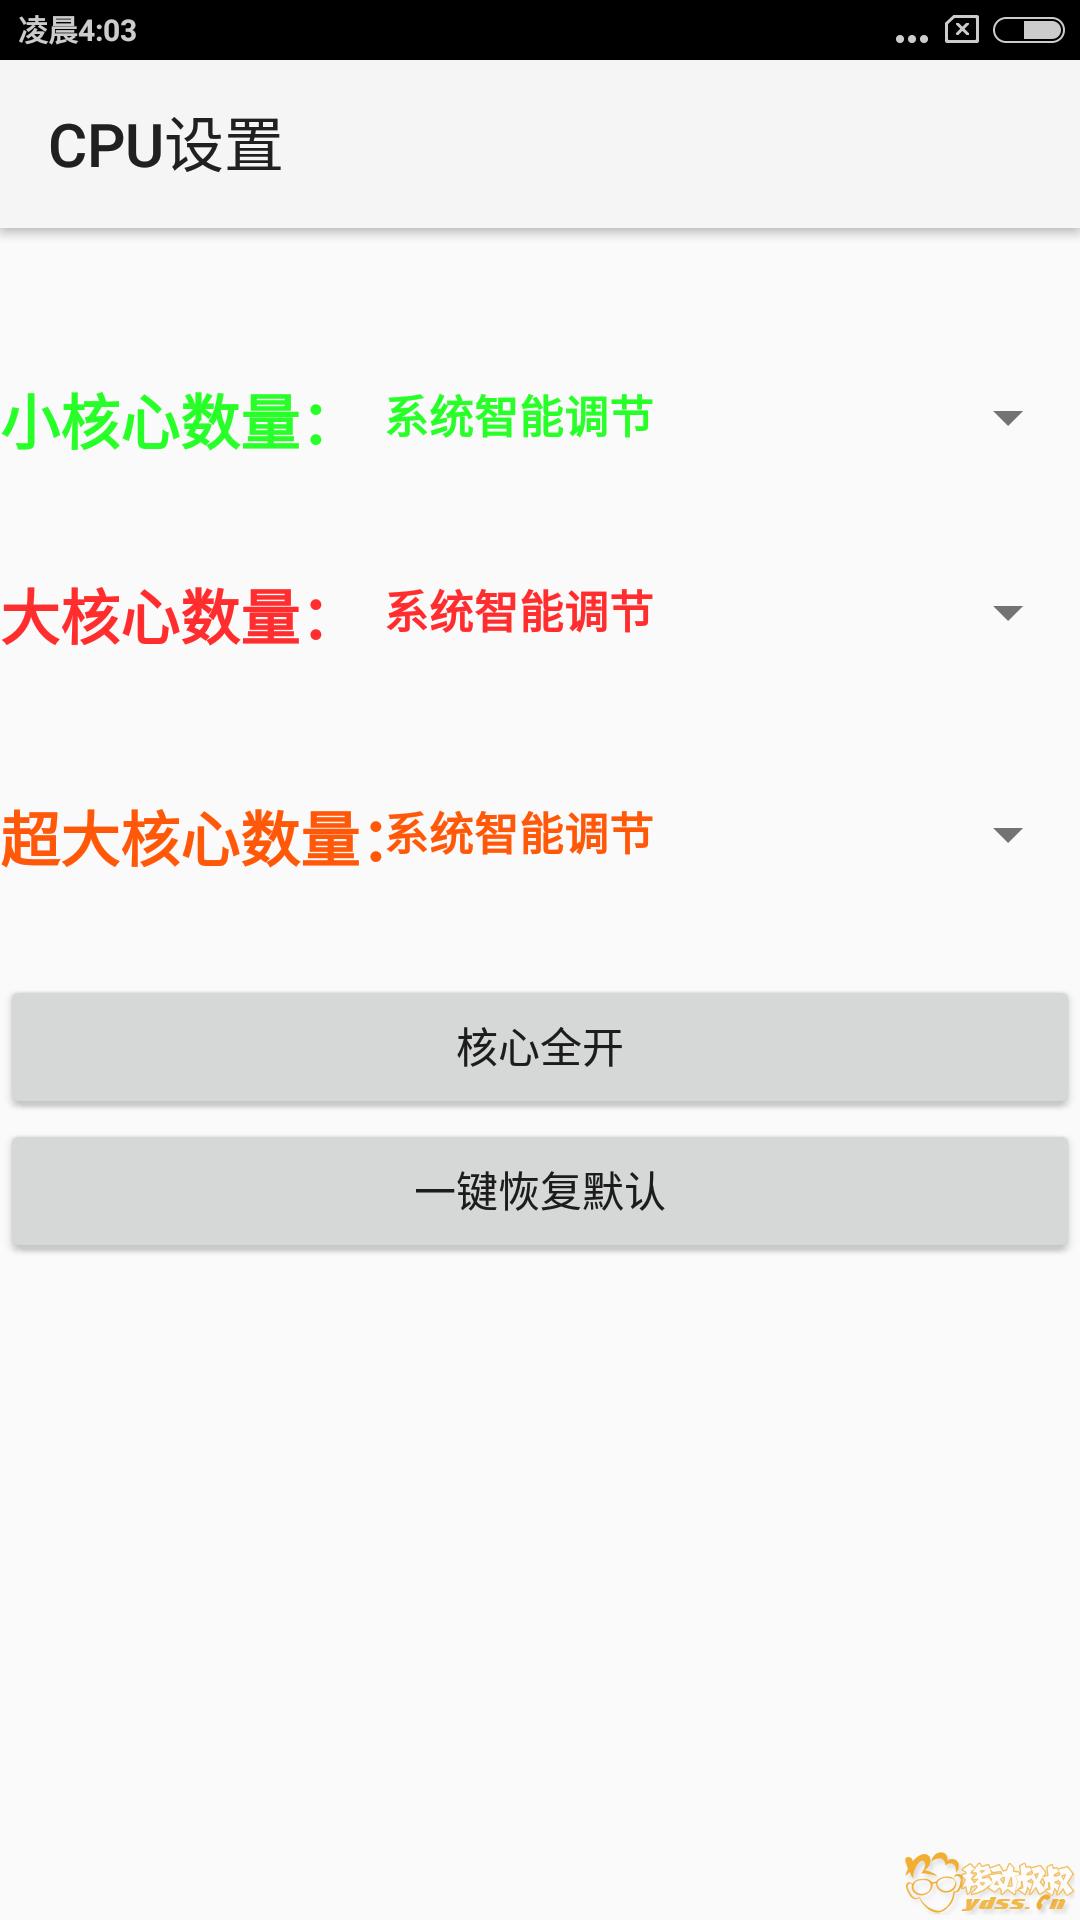 Screenshot_2018-03-06-04-03-53-641_com.eui.xd.png